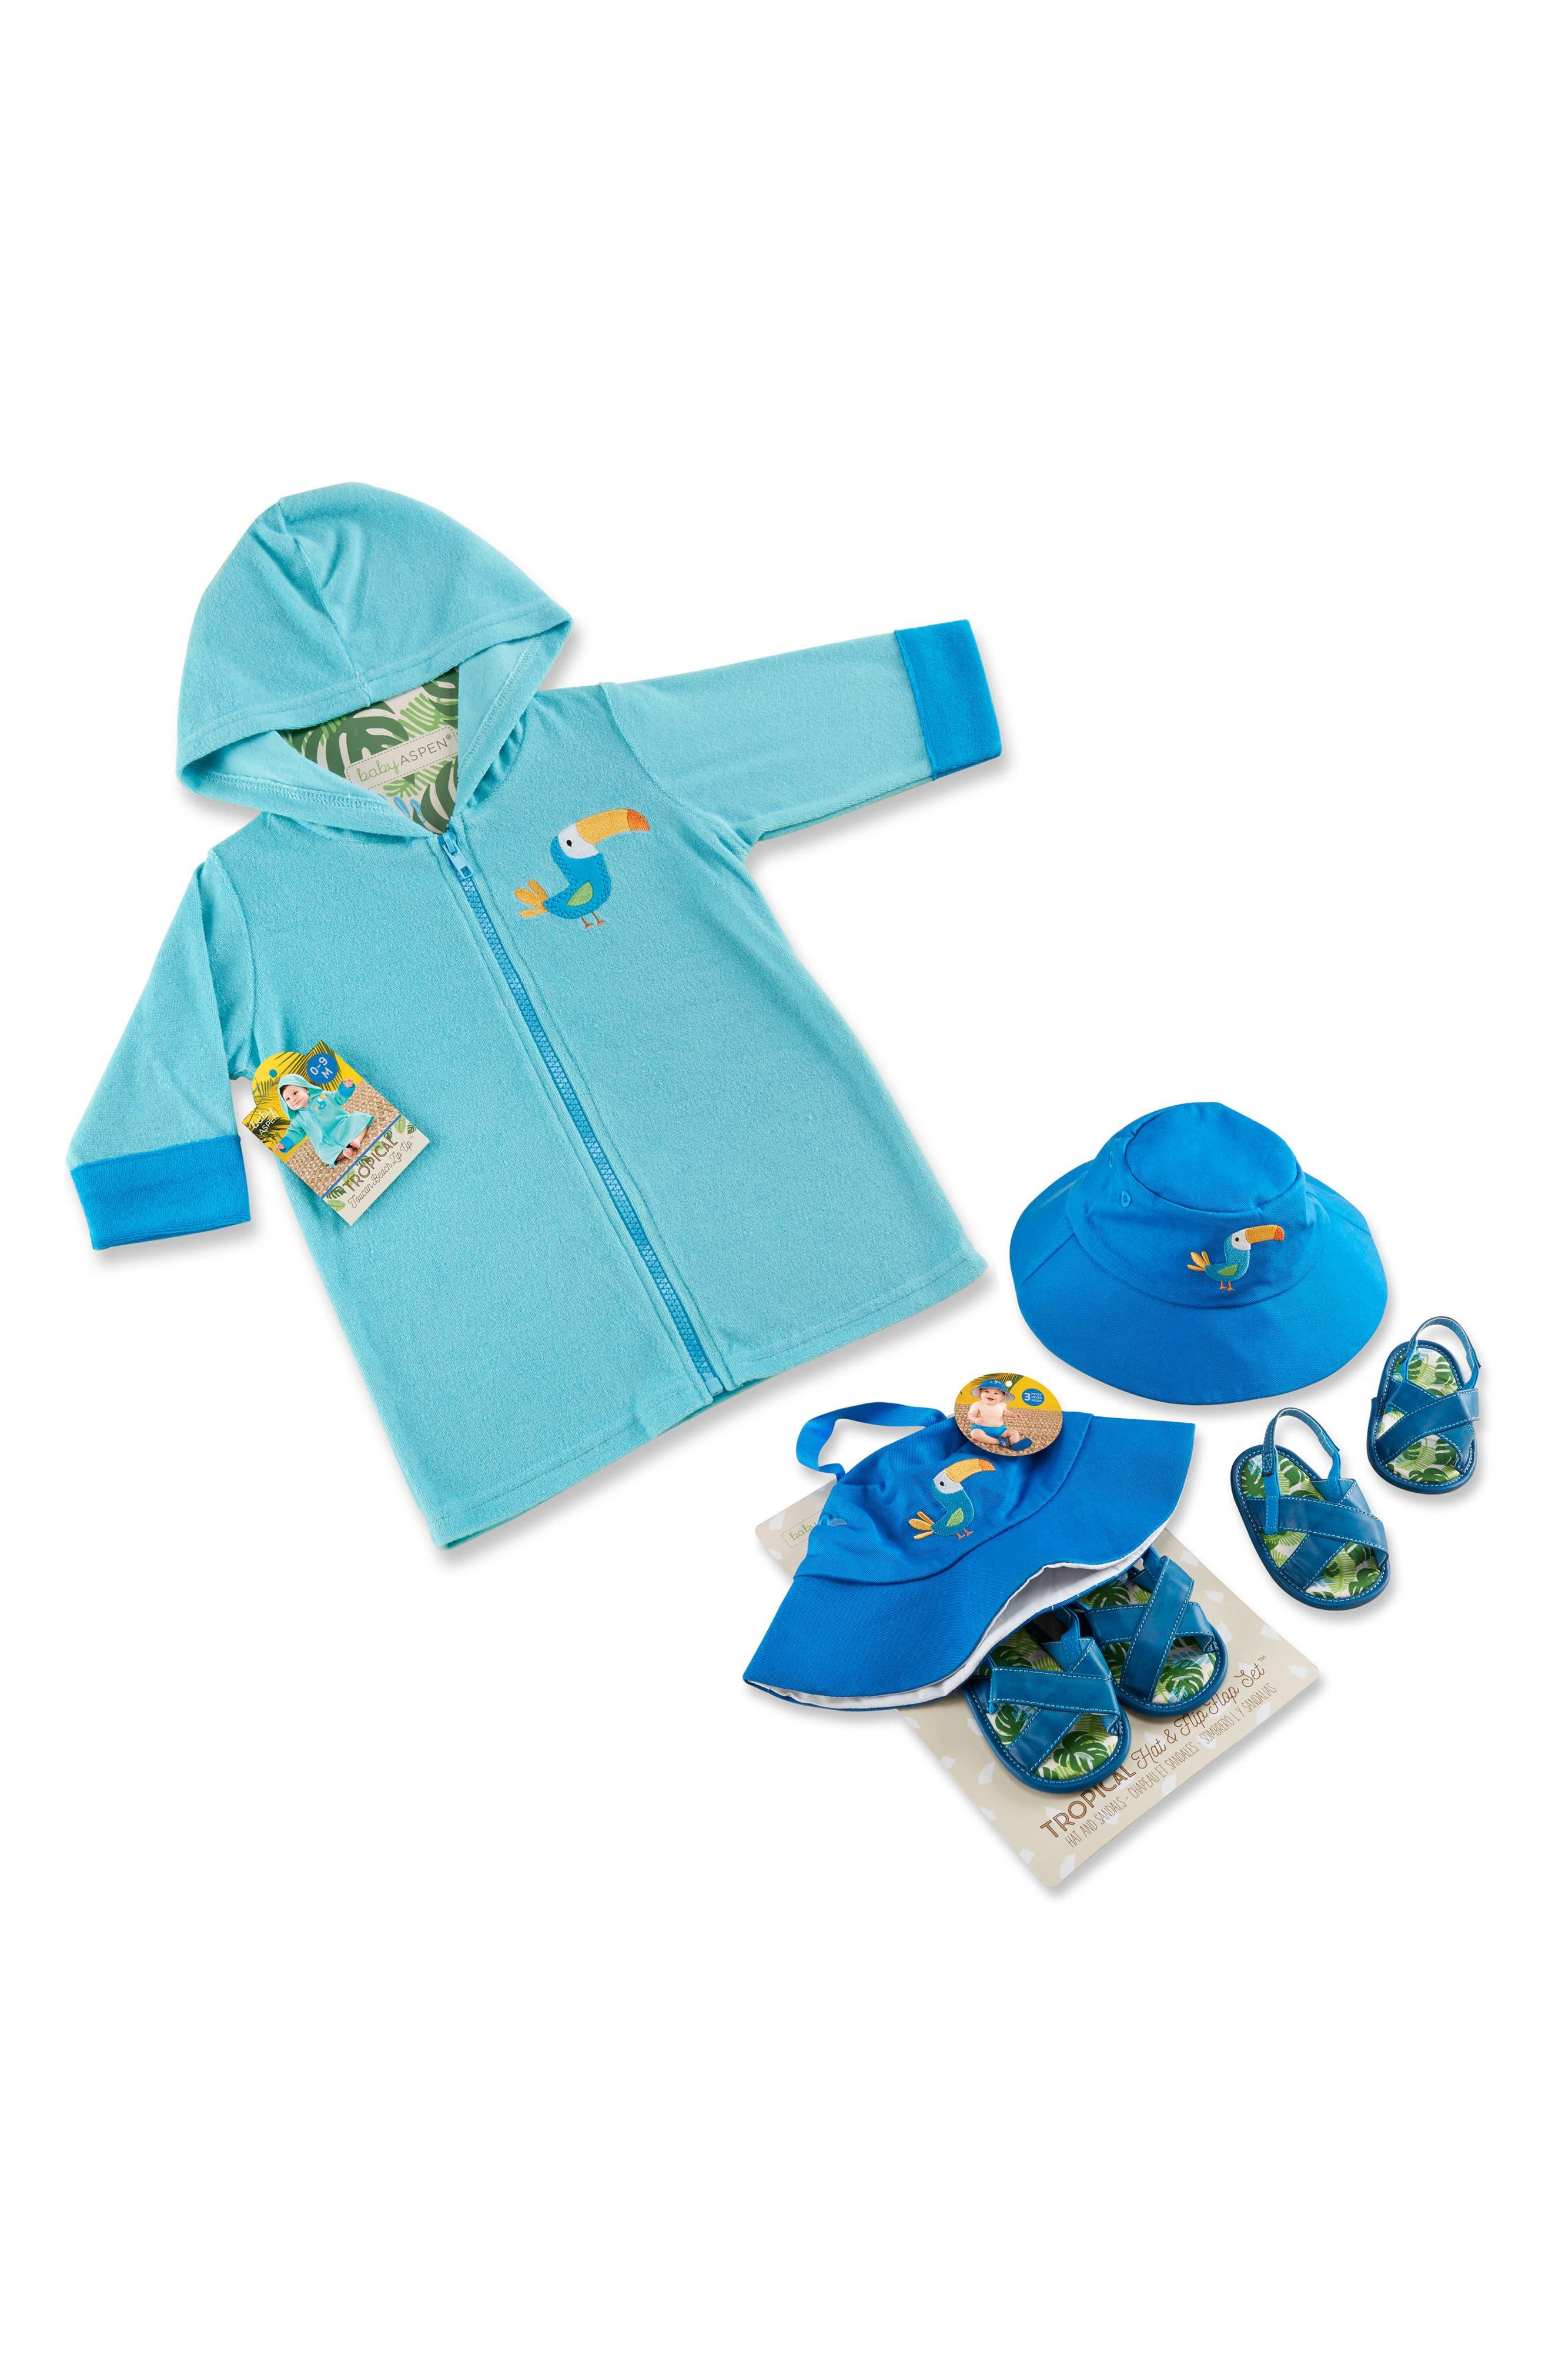 Tropical 3-Piece Gift Set,                             Main thumbnail 1, color,                             BLUE